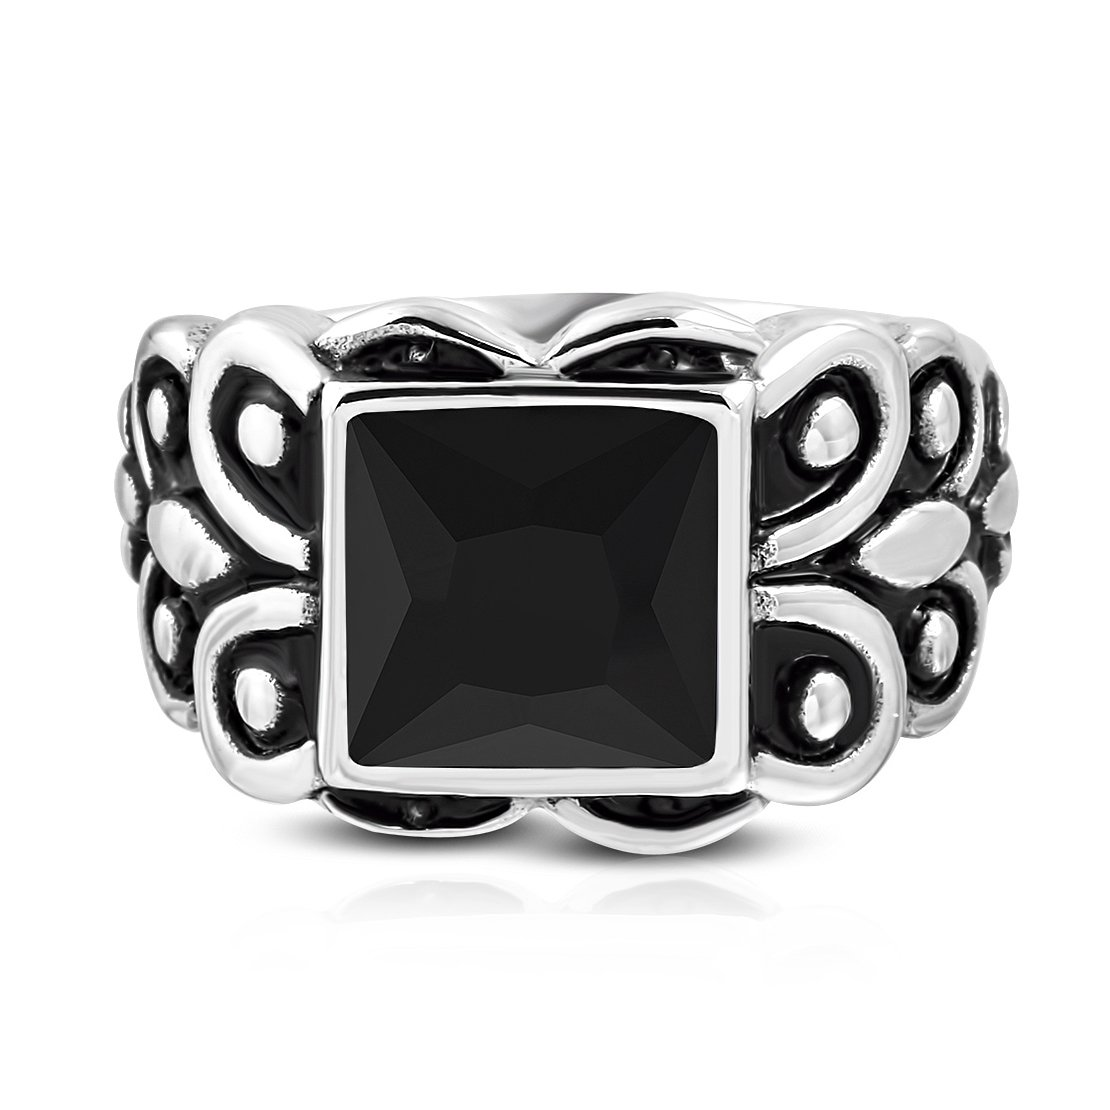 Stainless Steel 2 Color Fleur De Lis Flower Shank Bezel-set Cushion Biker Ring with Black Glass Stone by NRG Rings